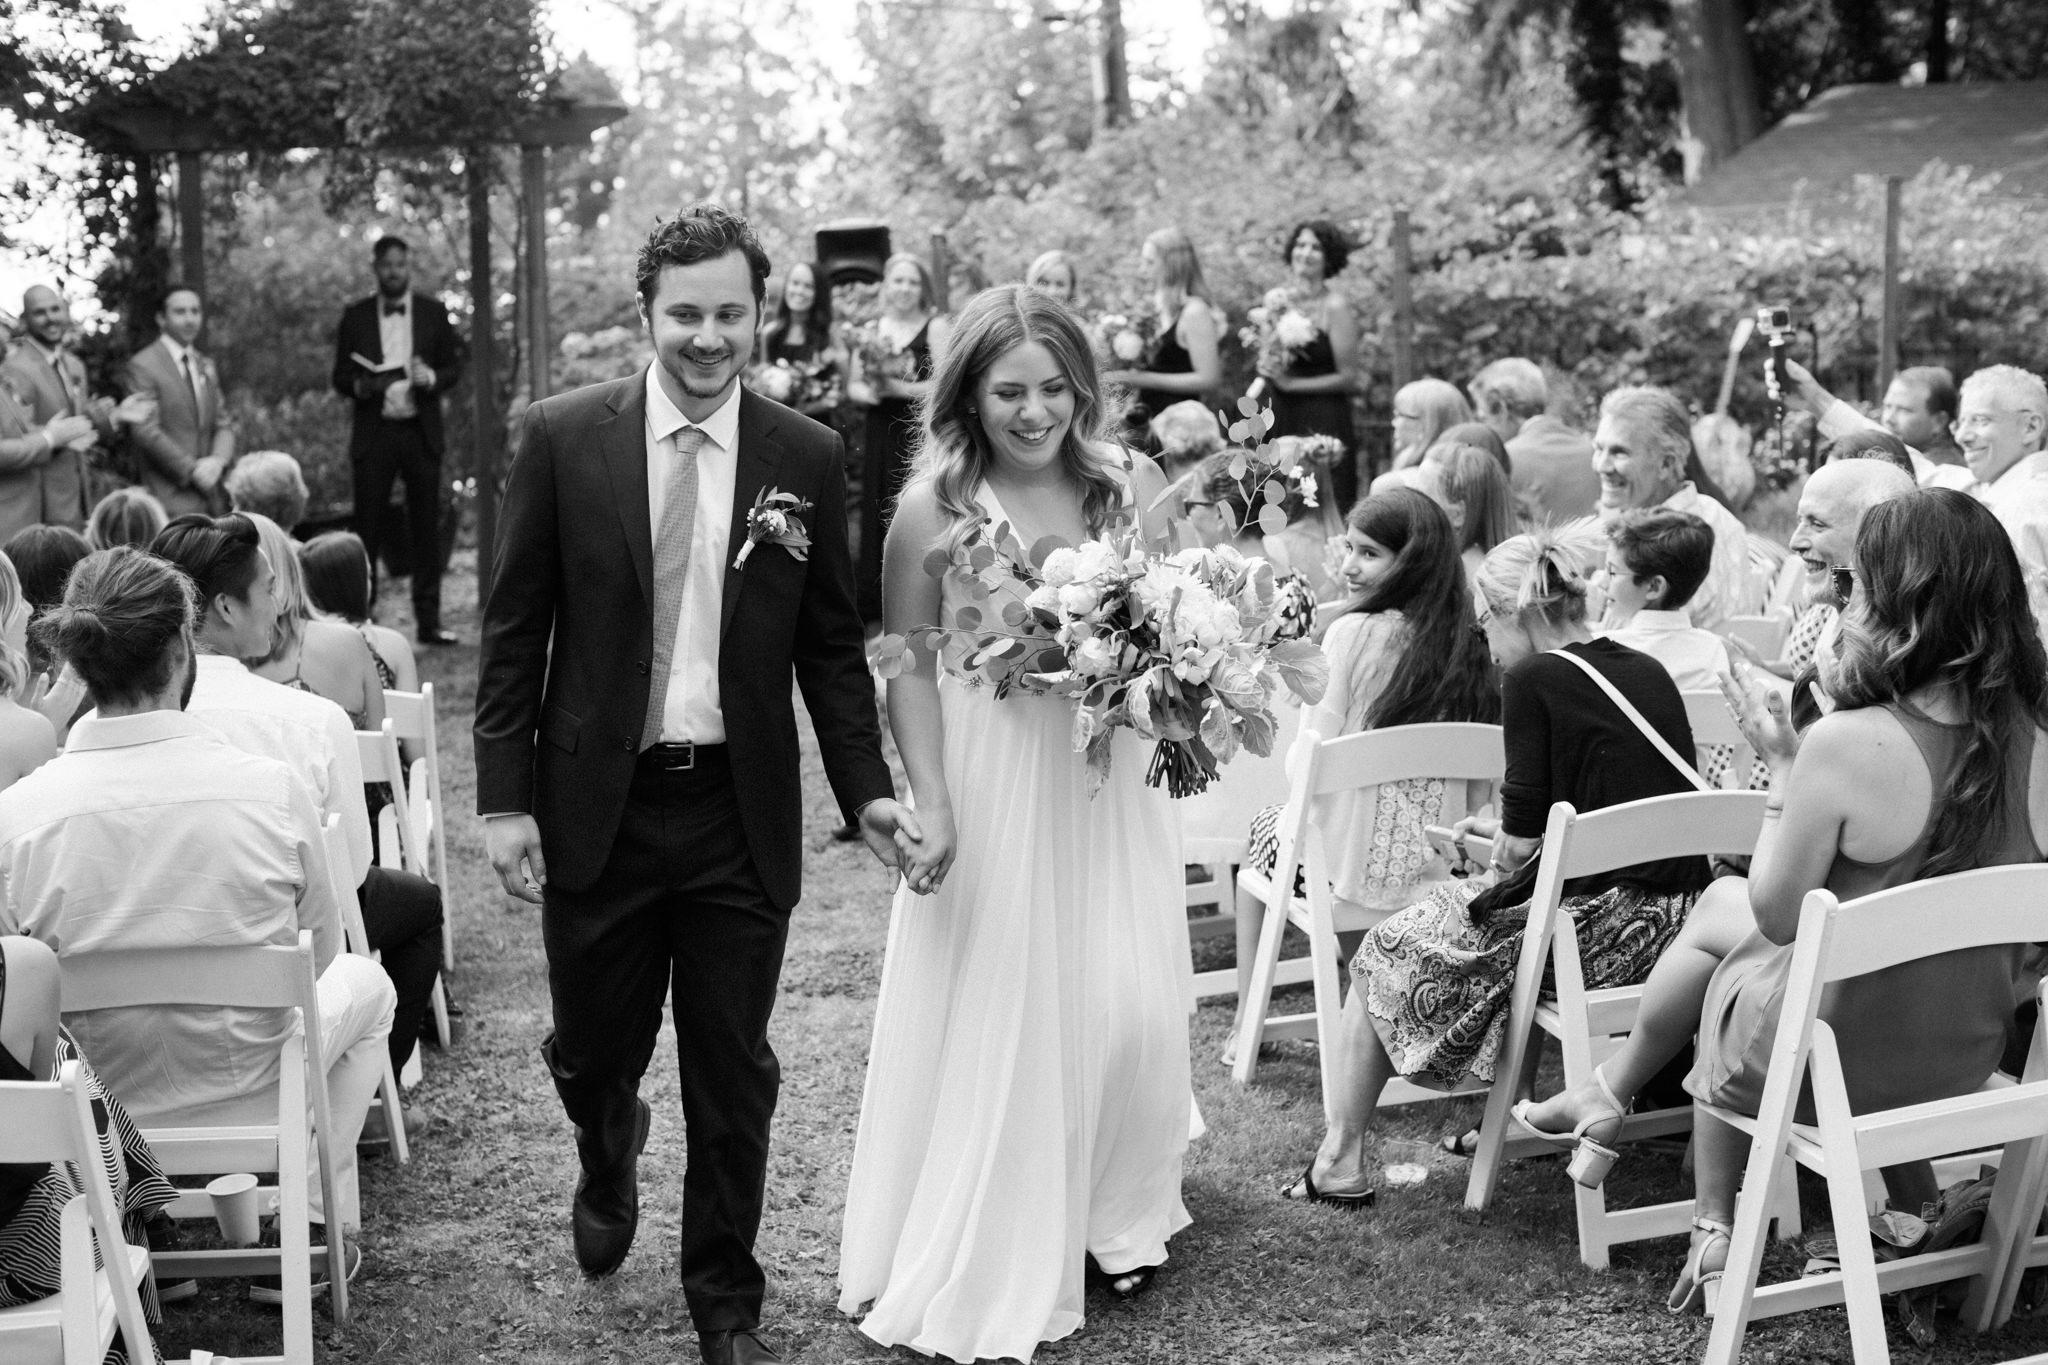 Backyard-Bainbridge-Island-Wedding-Alycia-Lovell-Photography-123.JPG